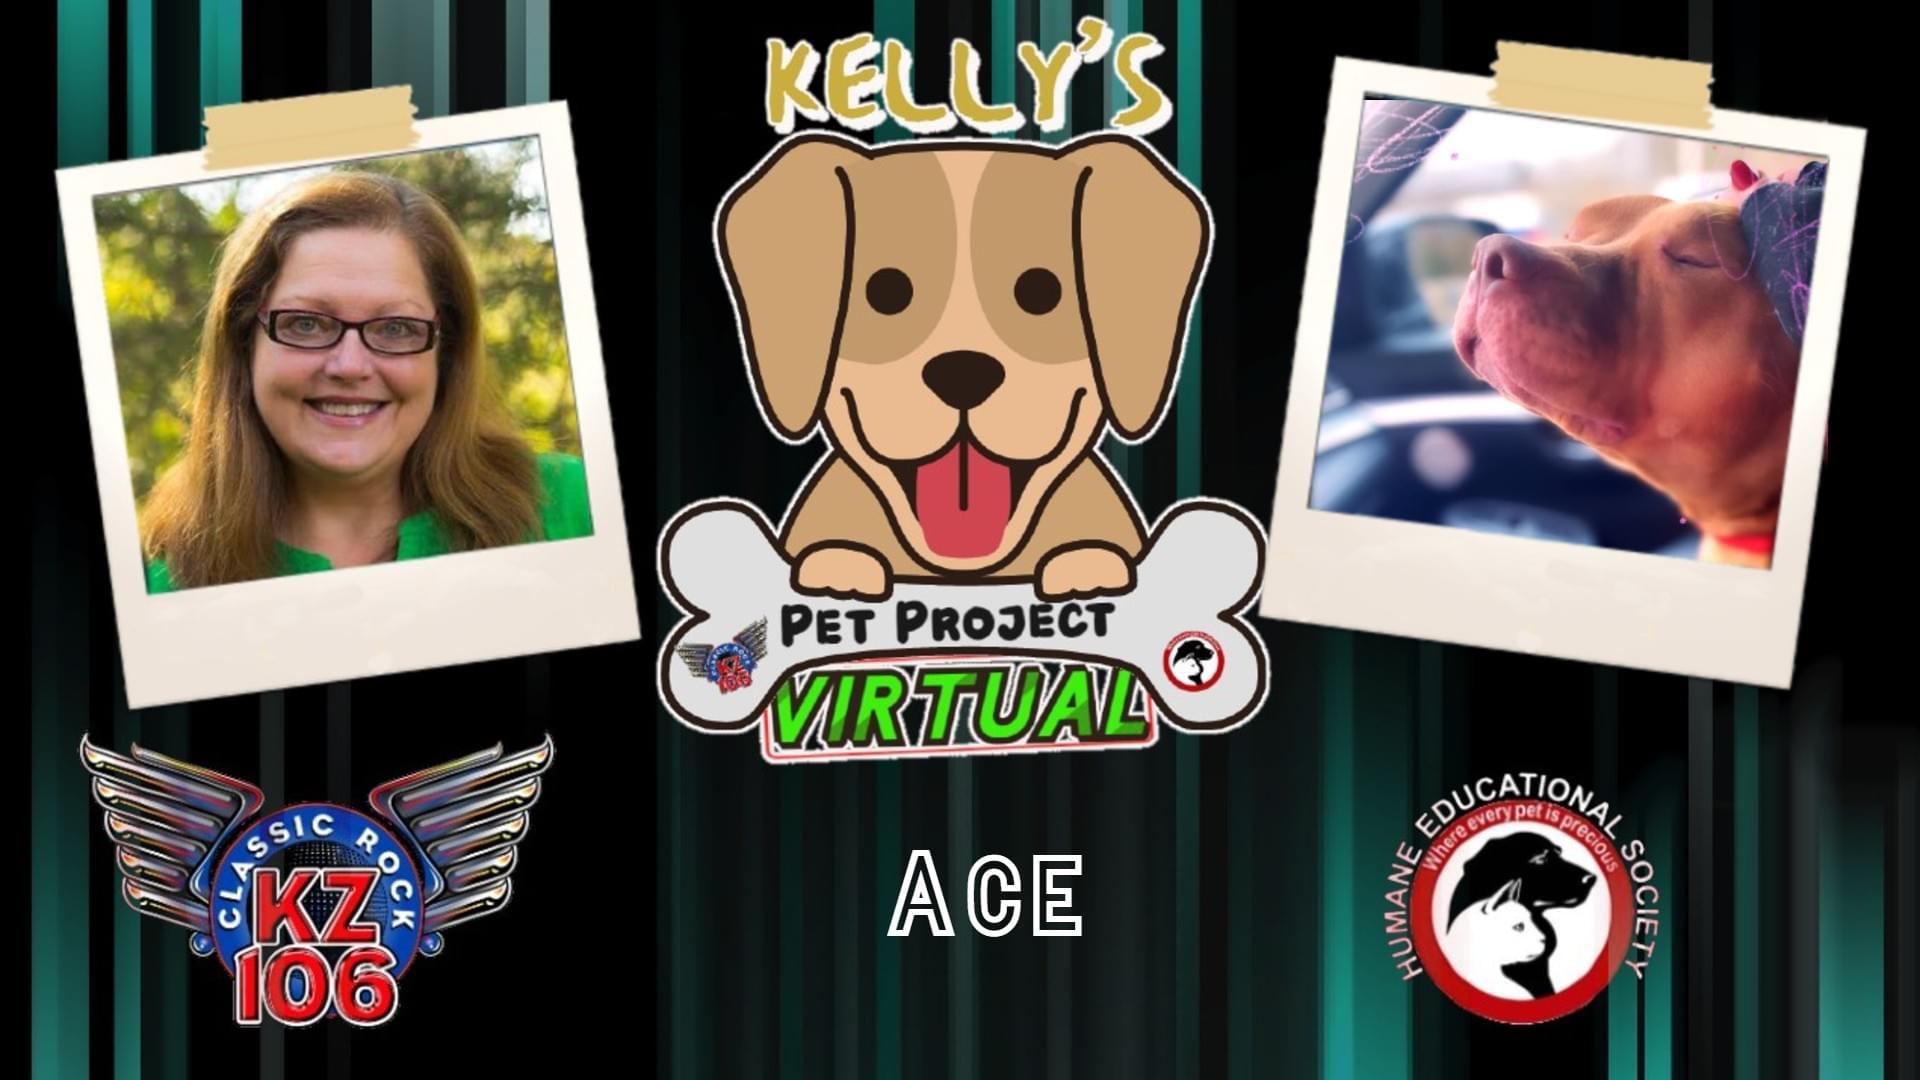 Kelly's Pet Project: Ace